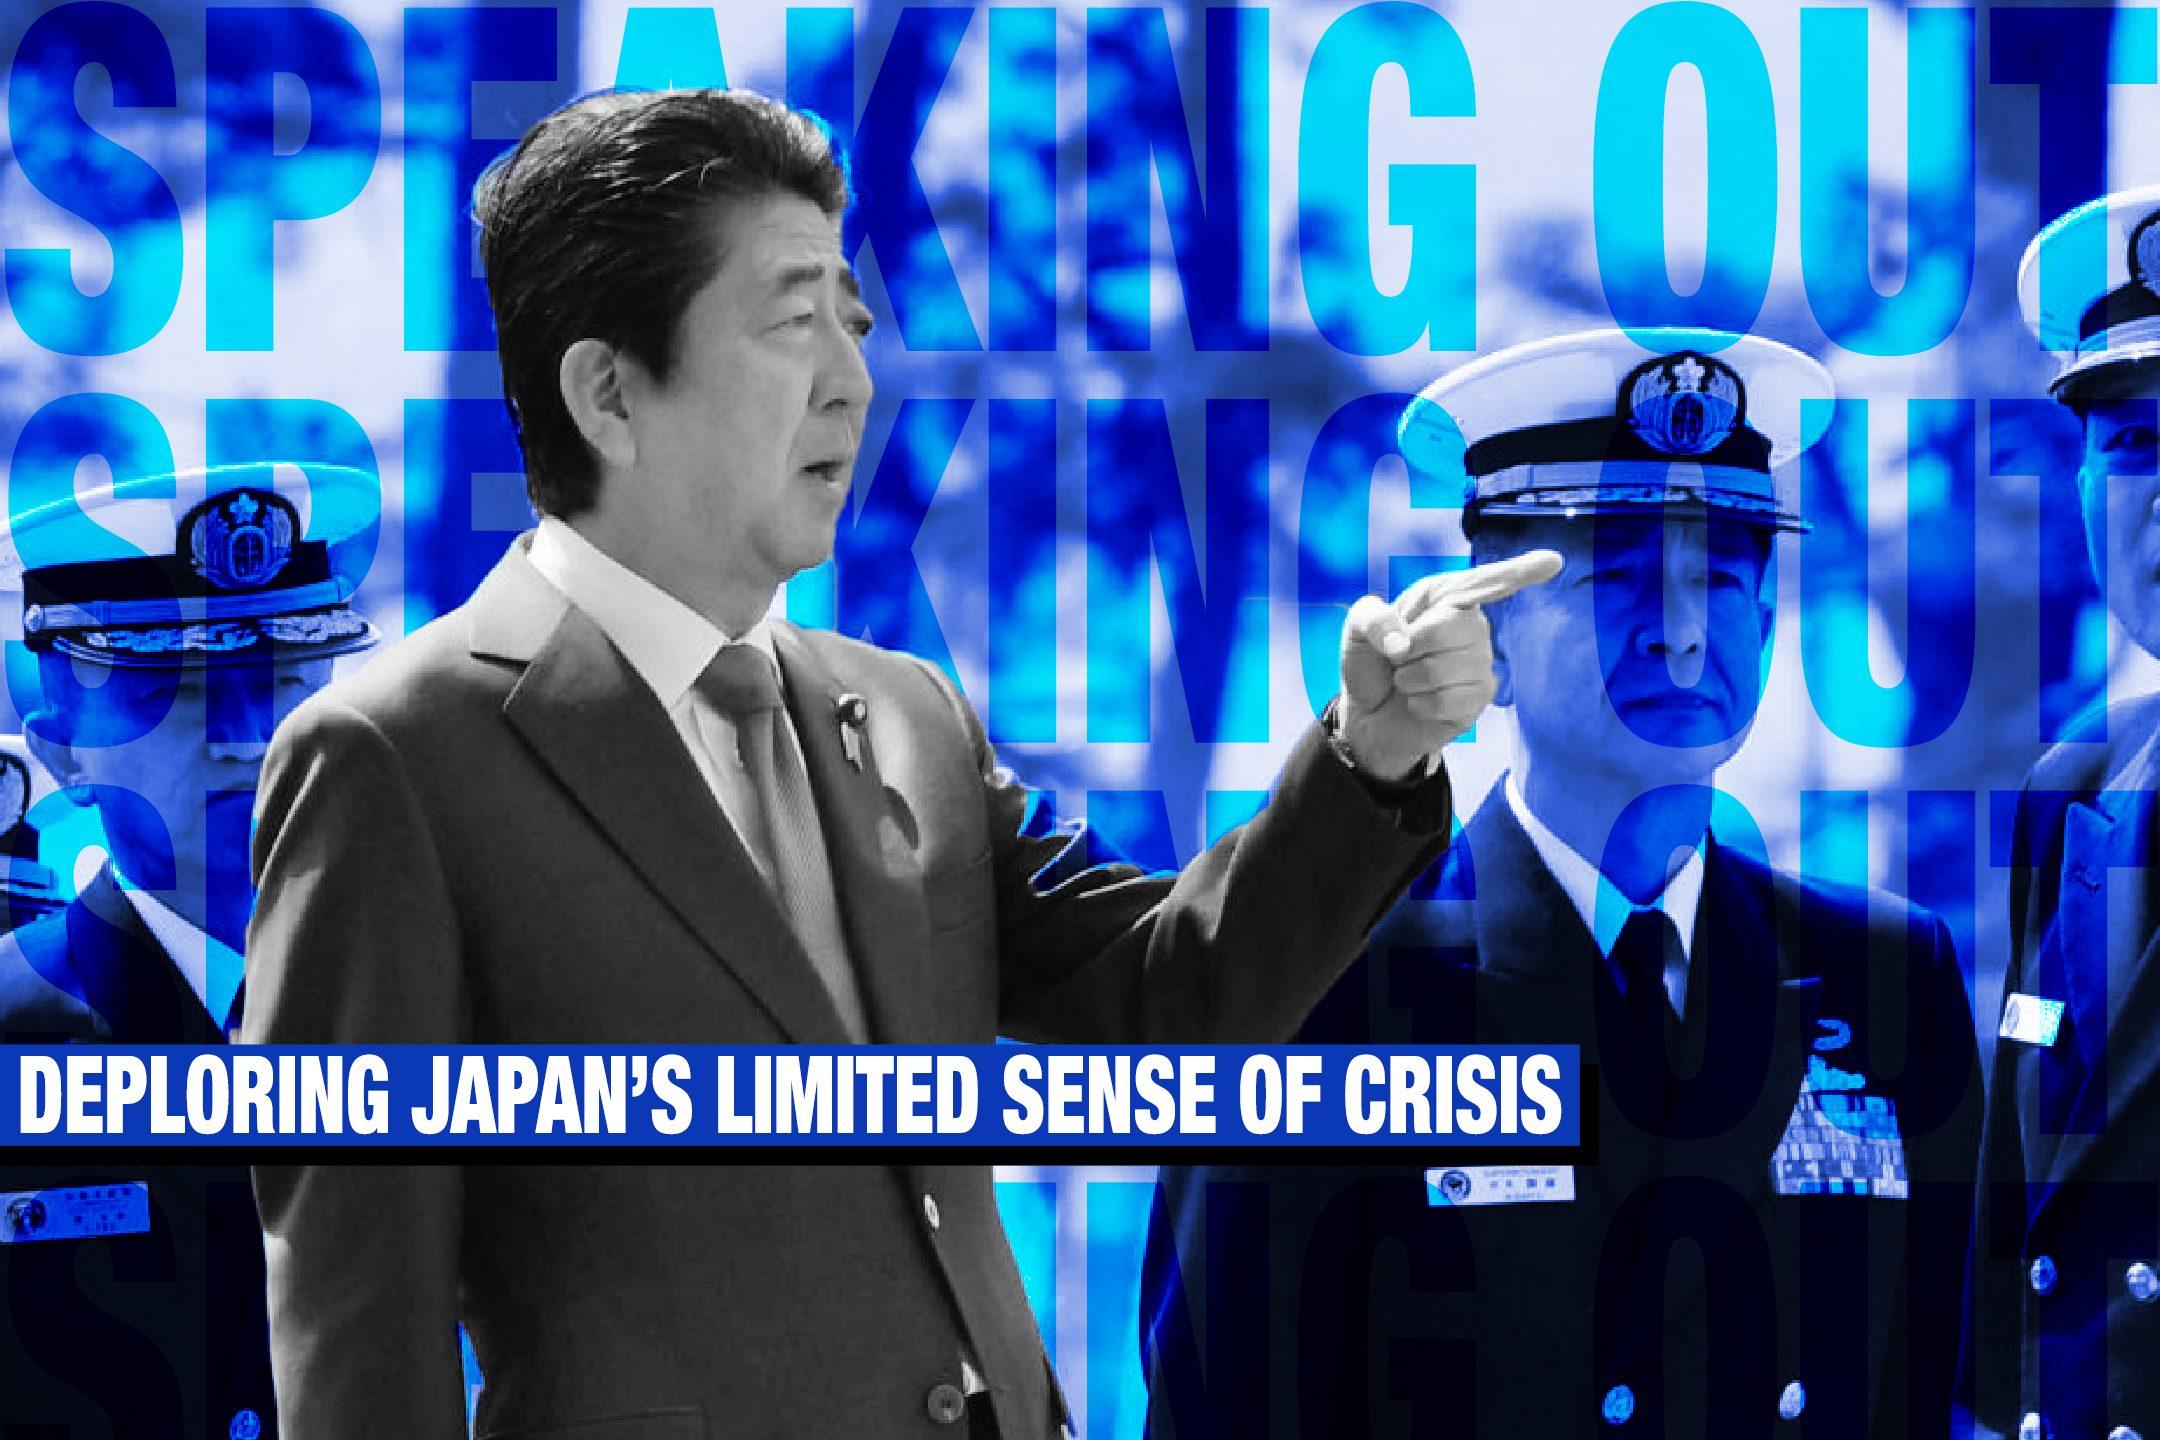 speaking-out-deploring-japans-limited-sense-of-crisis-hero